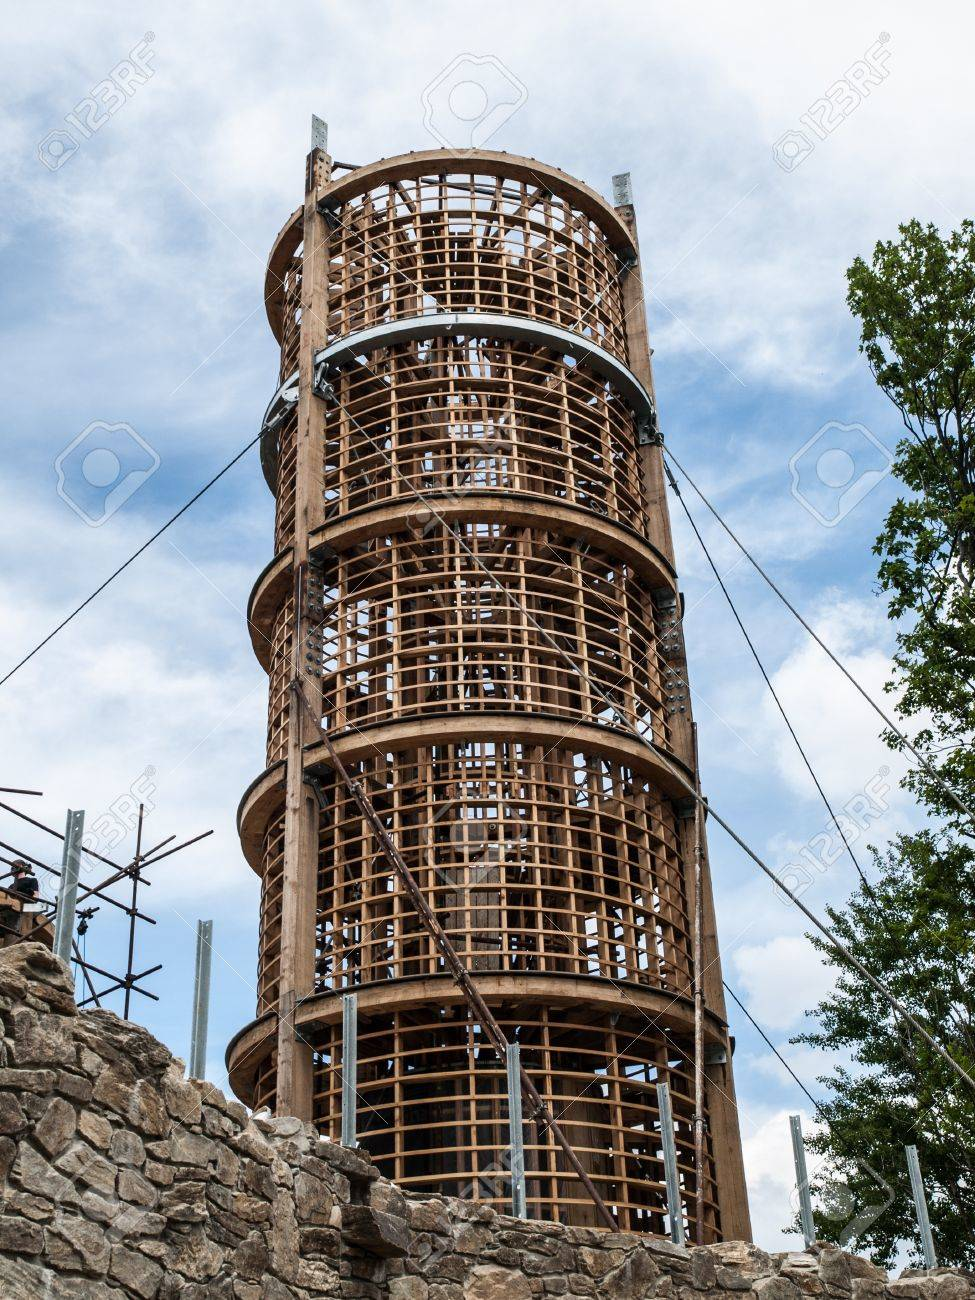 Wooden lighthouse under construction (Korenov, Czech Republic) Stock Photo - 21264476